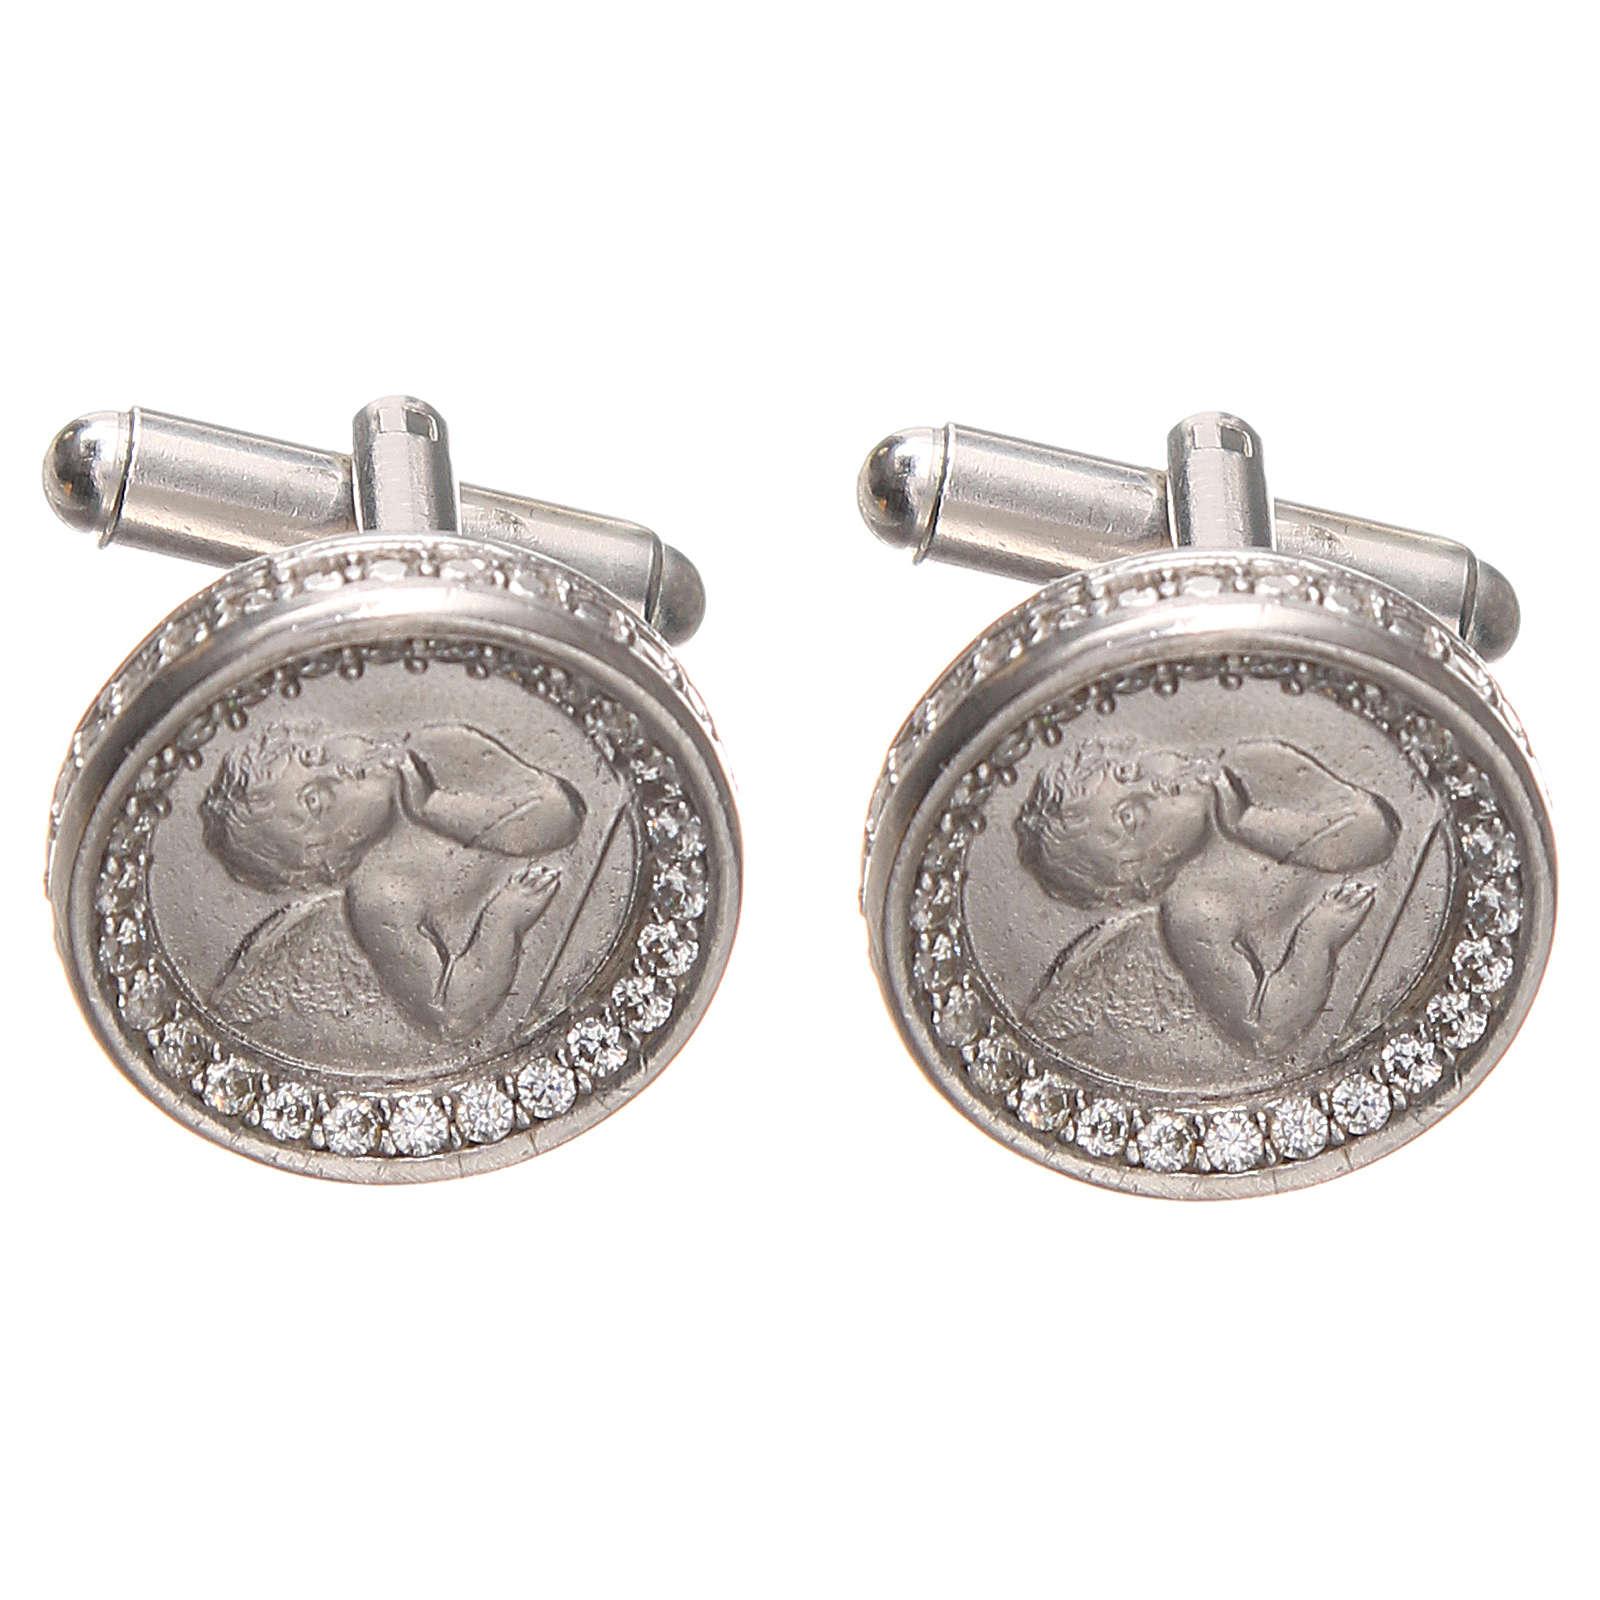 Spinki męskie srebro 800 z Aniołem Raffaella 1.7 cm 4